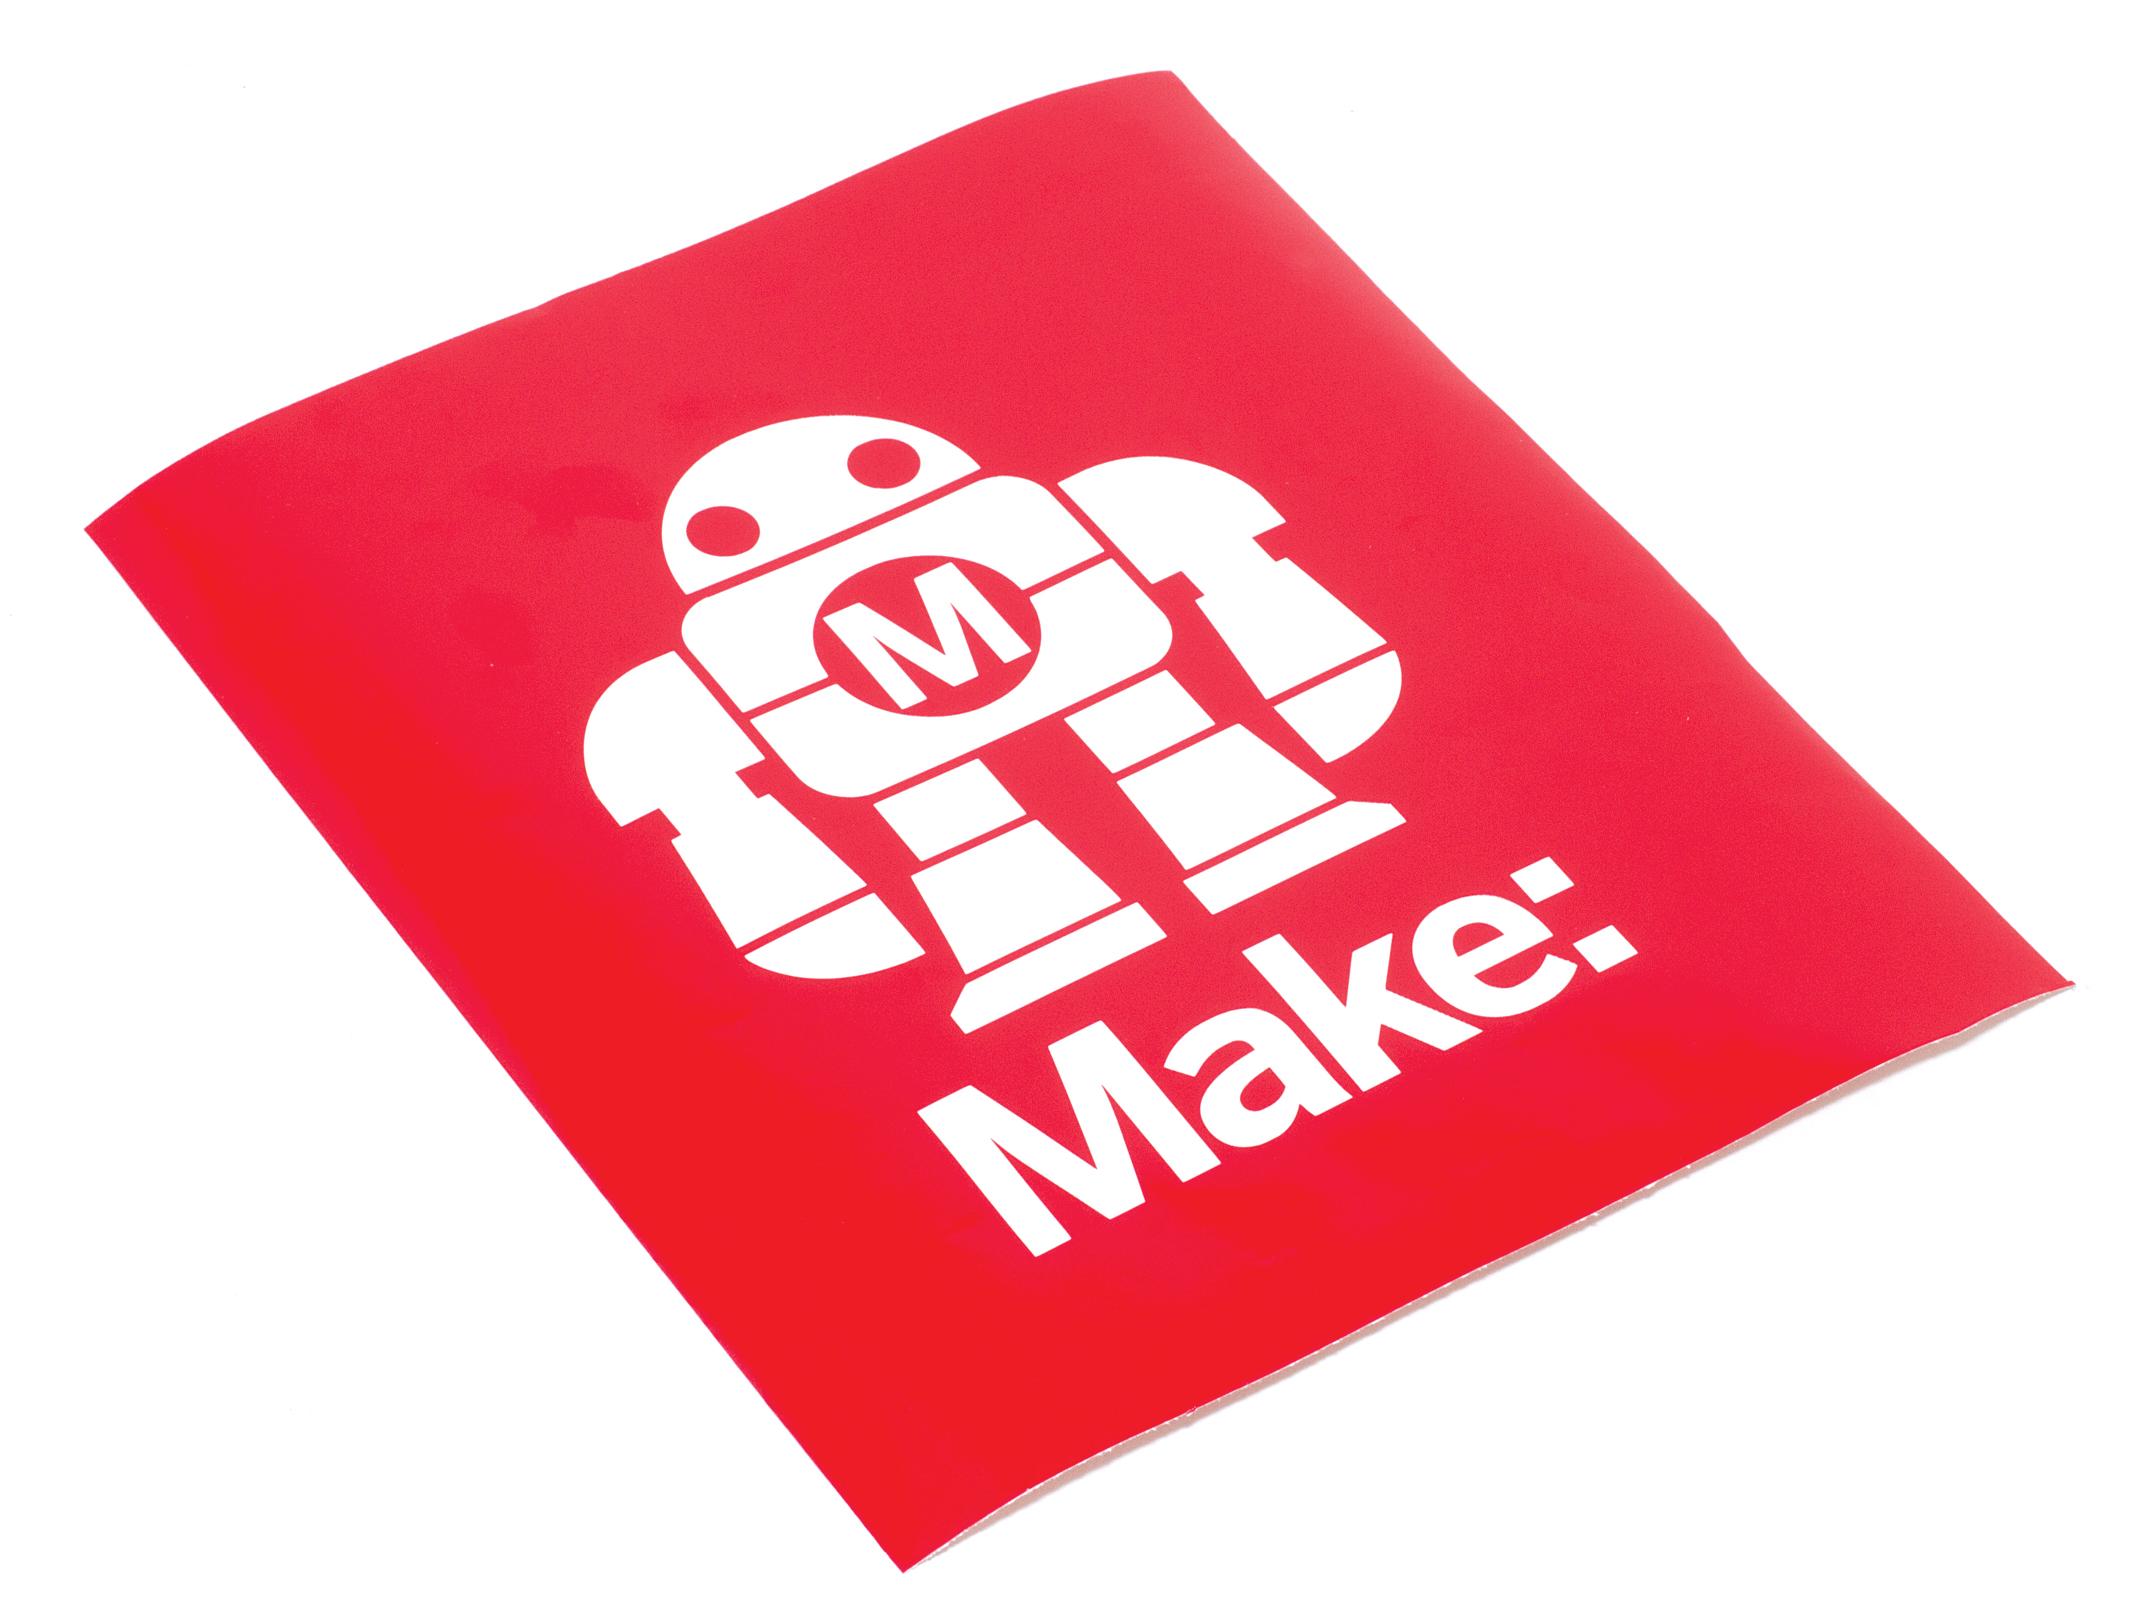 Simple Silk Screen Printing Using A Vinyl Cutter Make